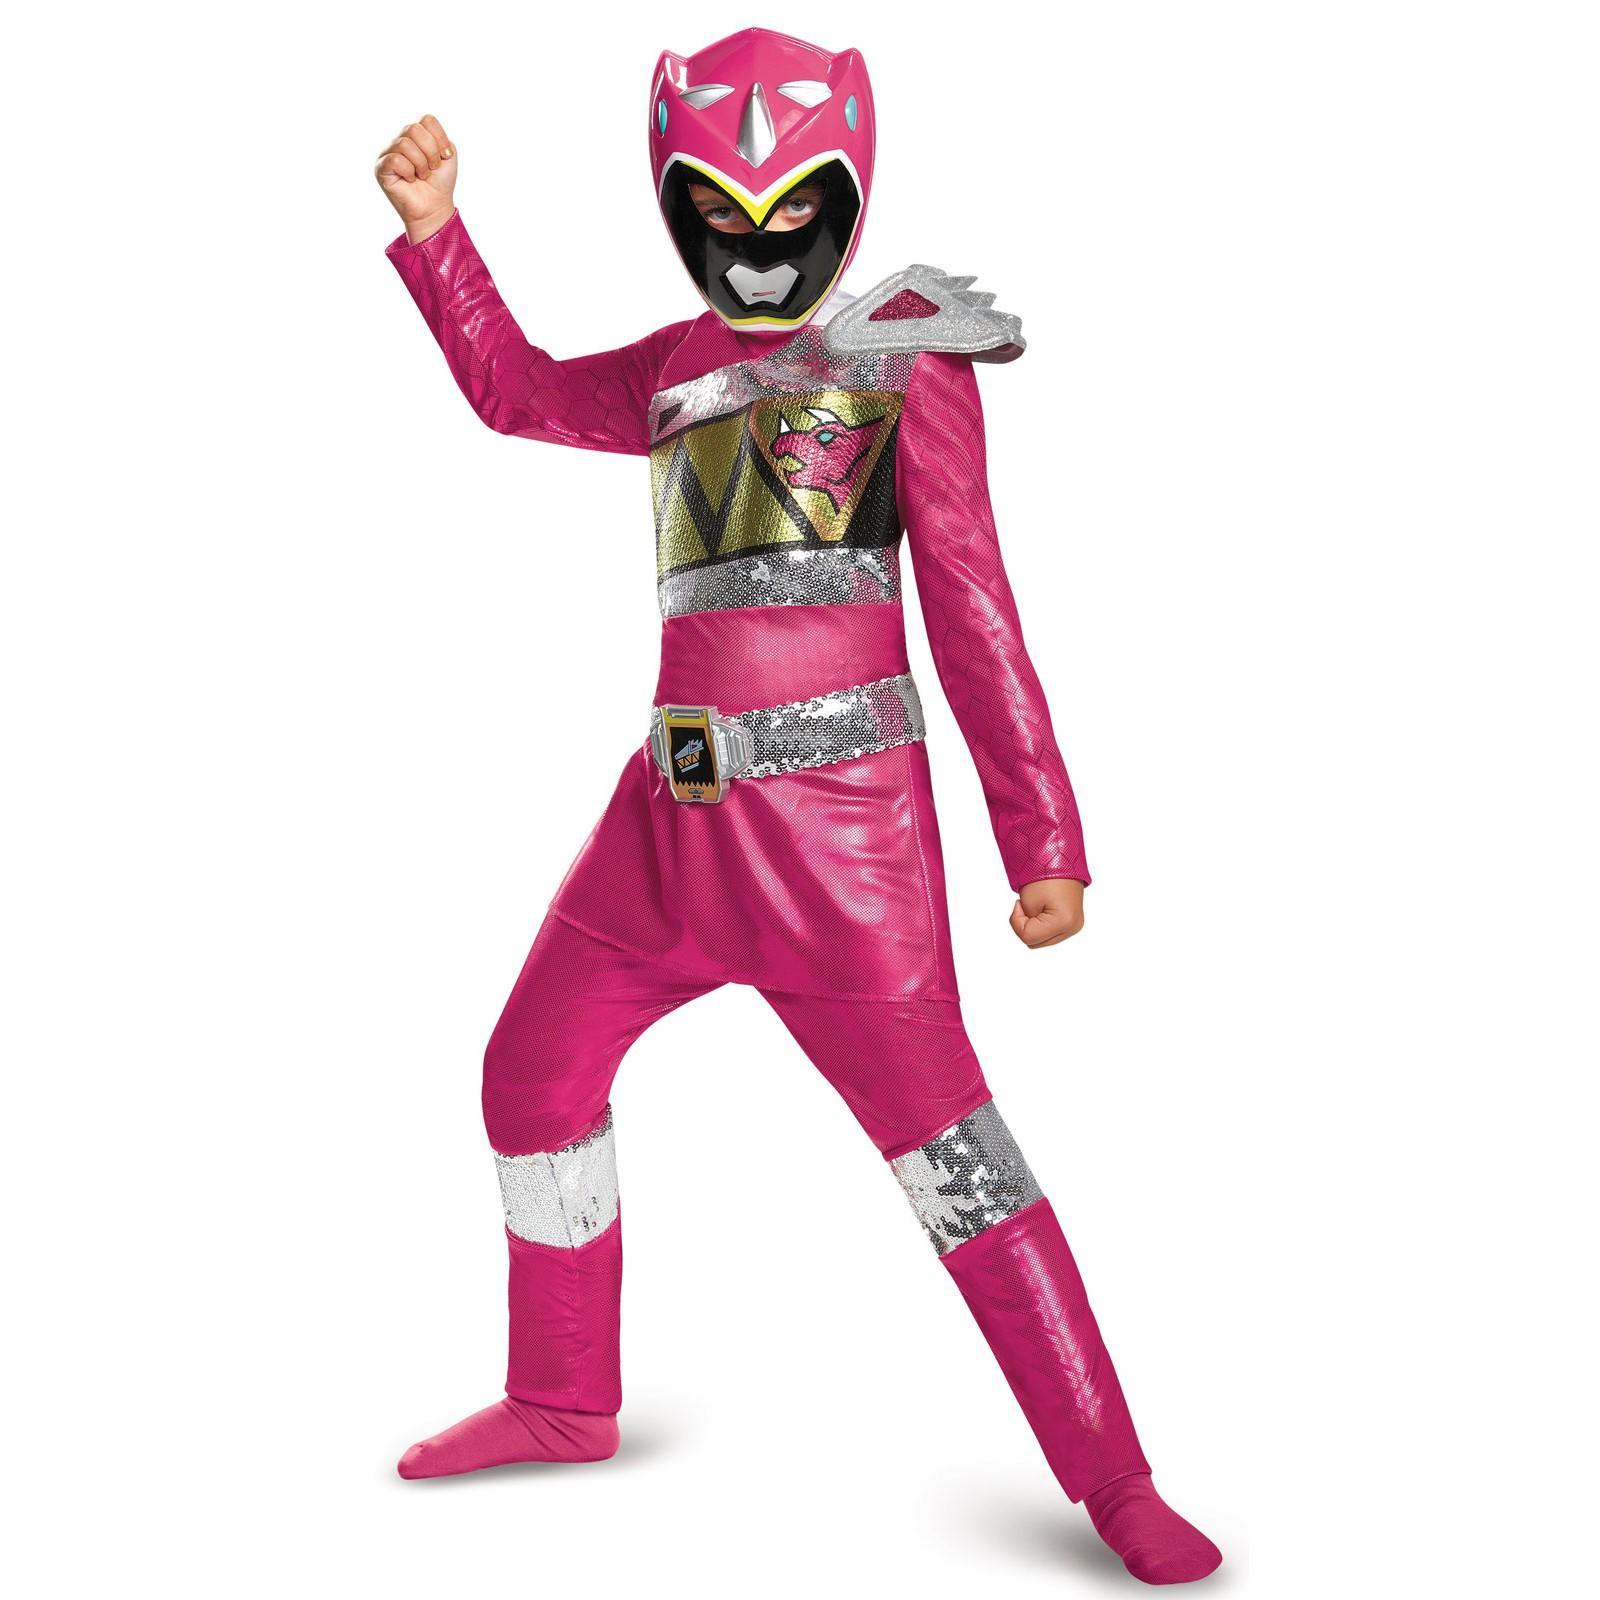 Henshin Grid: Power Rangers Dino Charge Halloween Kid Costumes